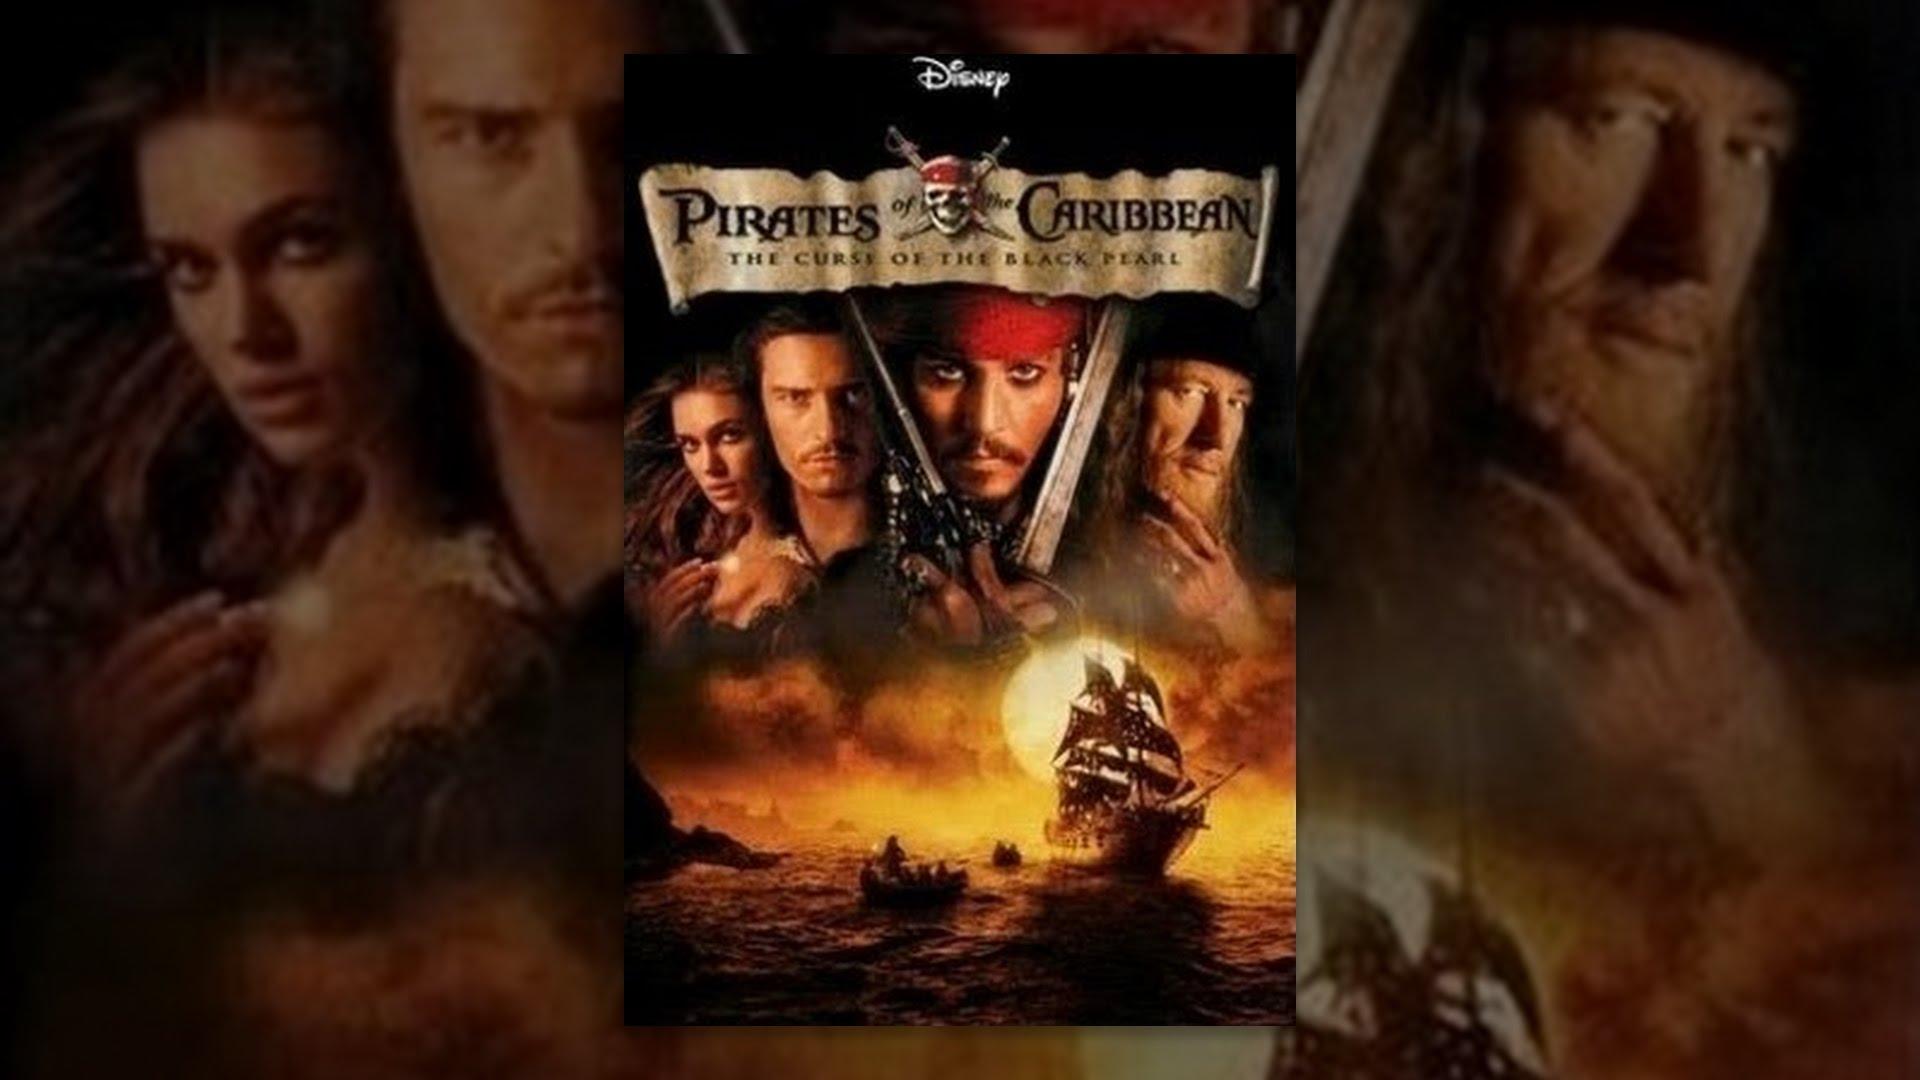 Pirates of the Caribbean On Stranger Tides 2011  IMDb